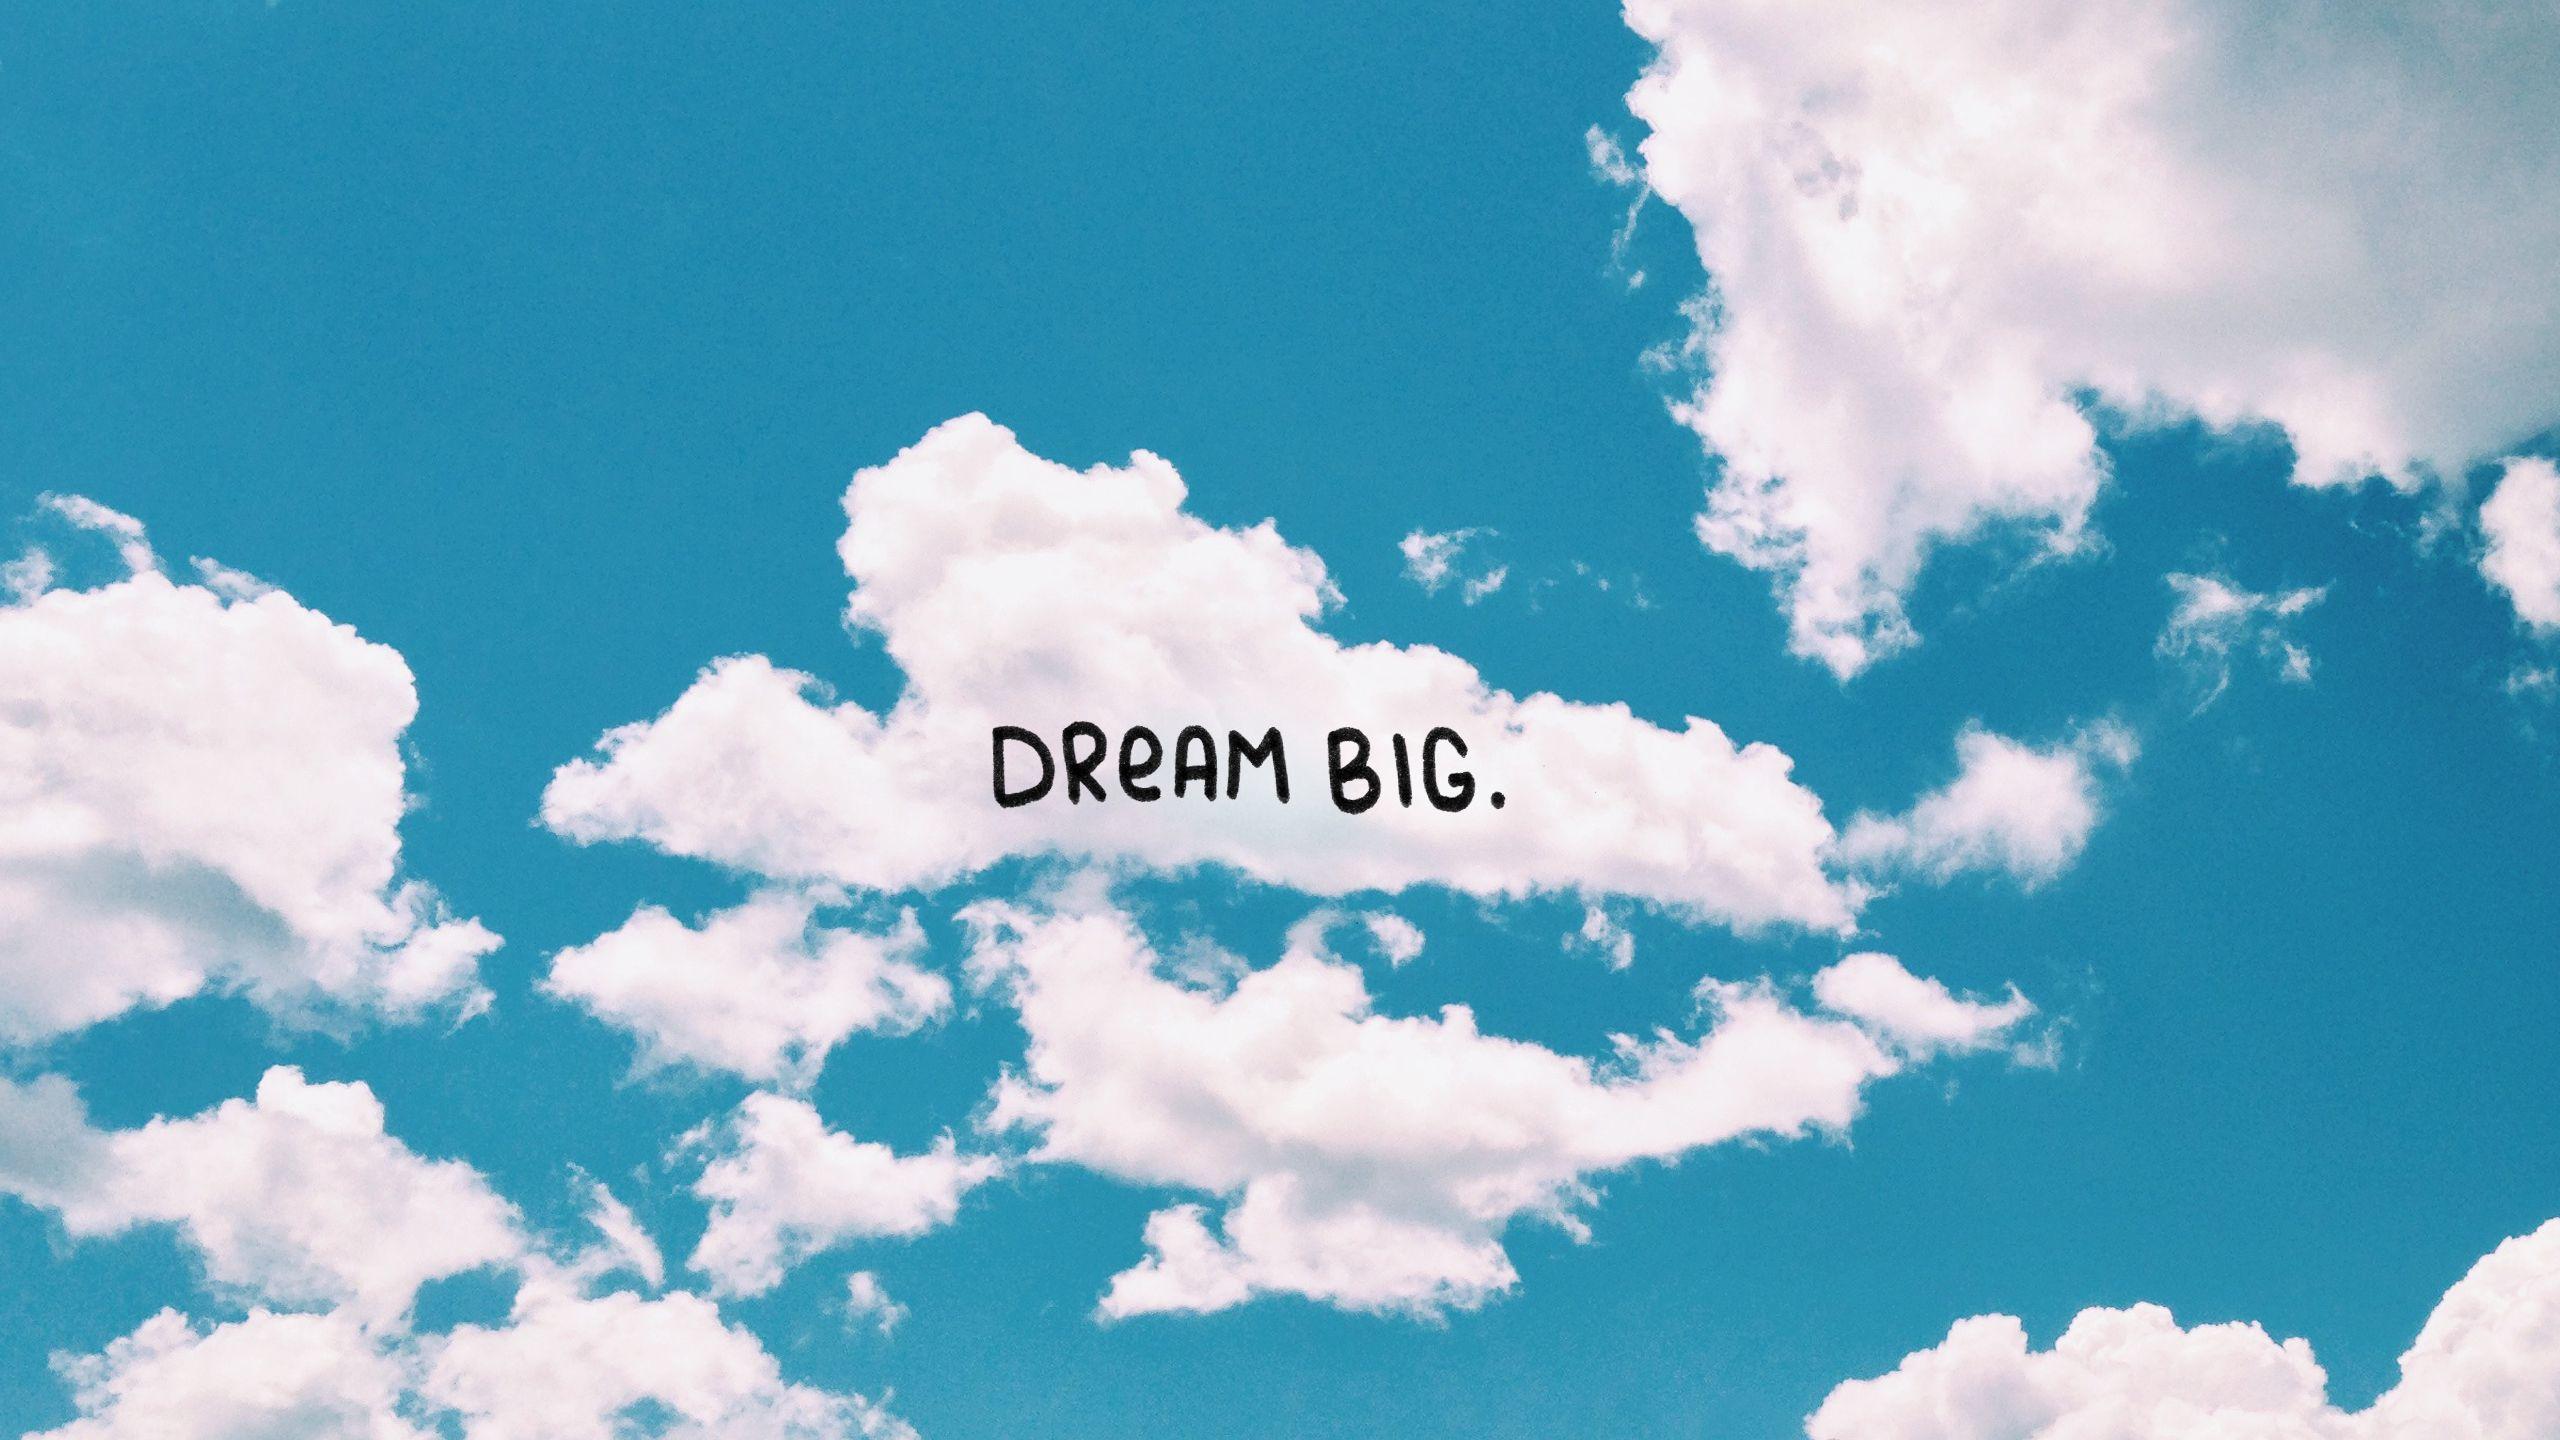 Dream big clouds blue sky desktop wallpaper background Wallpaper 2560x1440